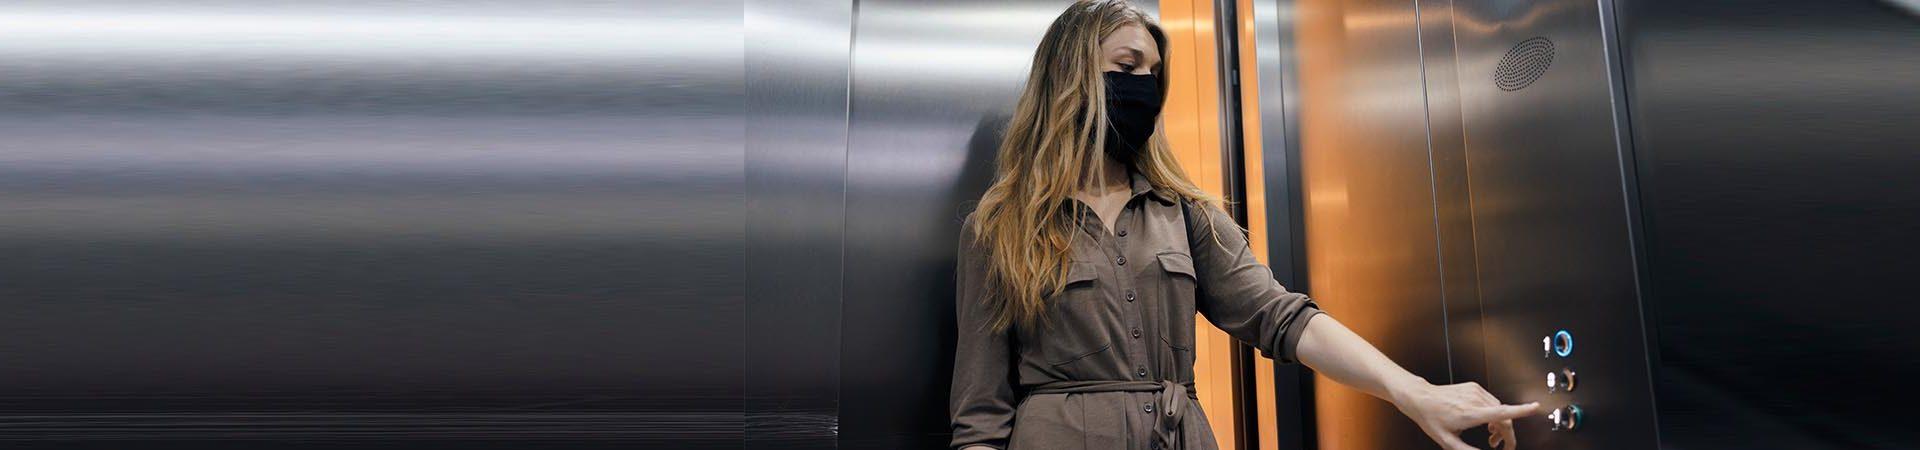 masks-in-indoor-common-areas